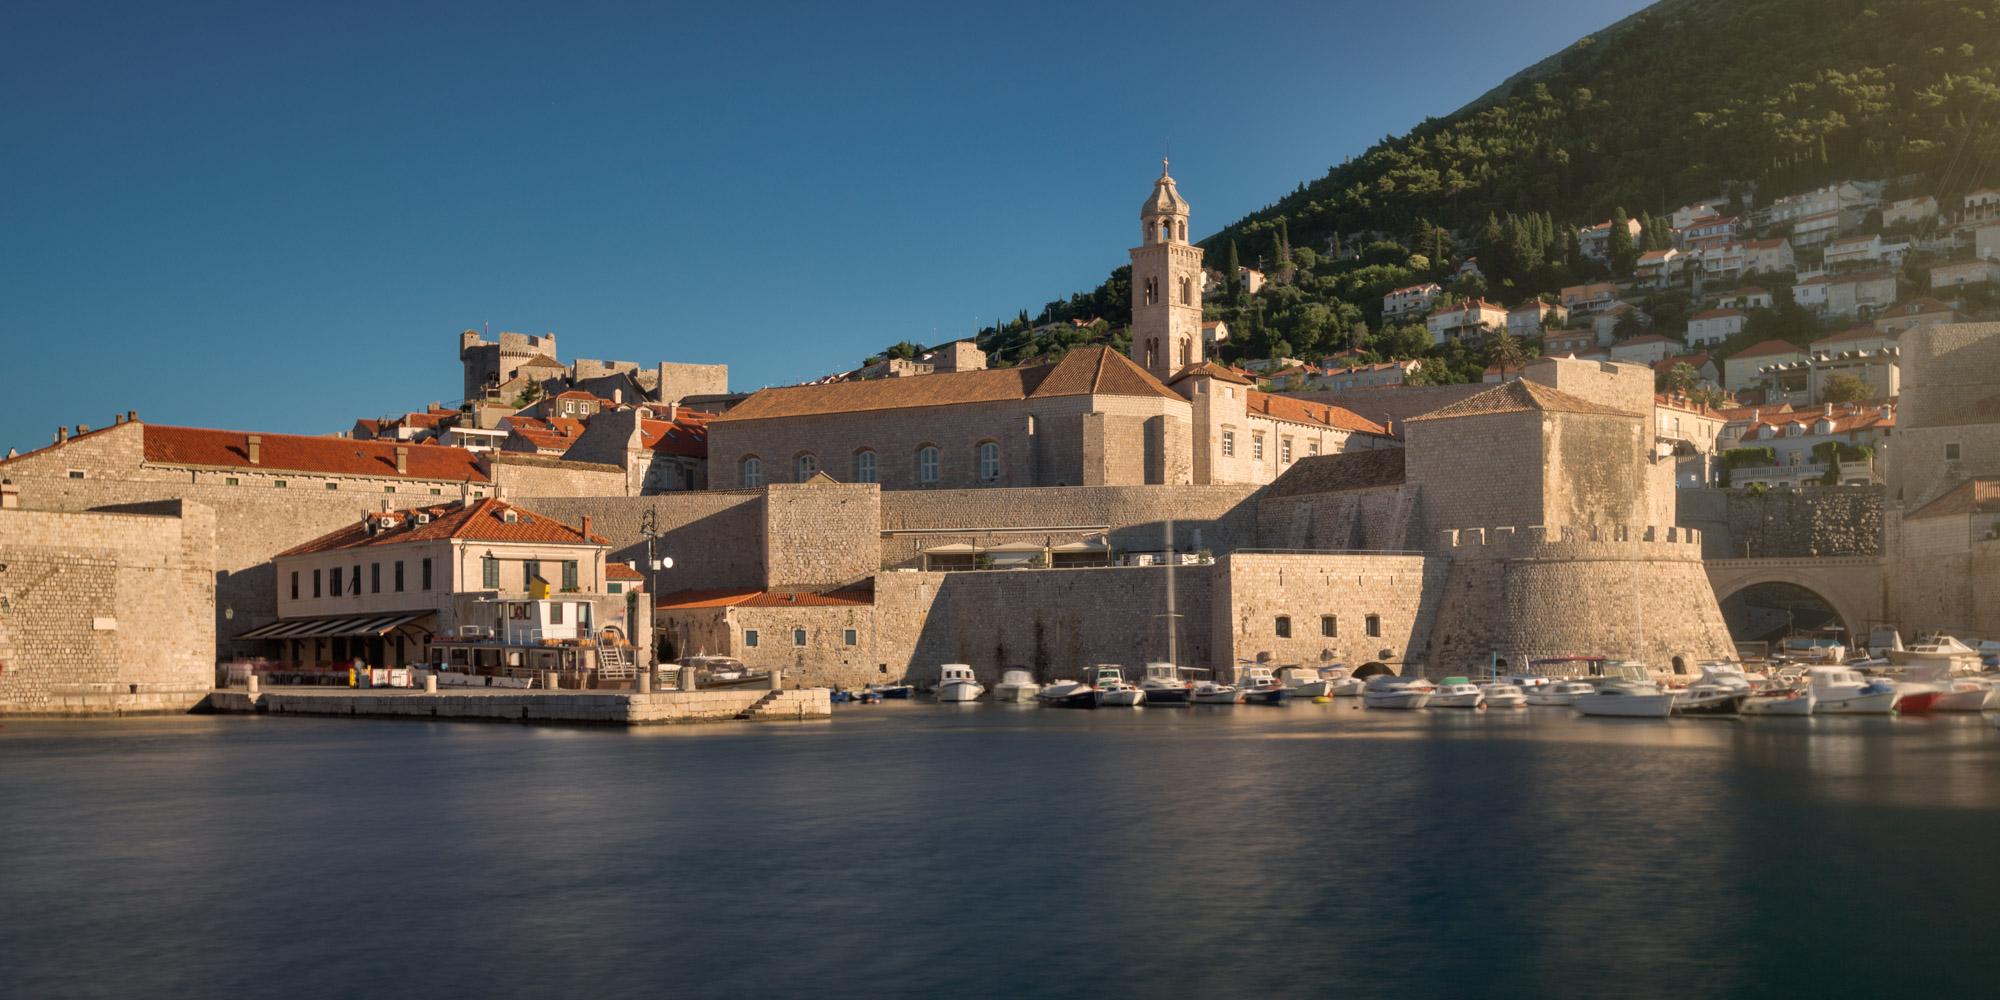 Dubrovnik City Walls and Towers, Dubrovnik, Croatia